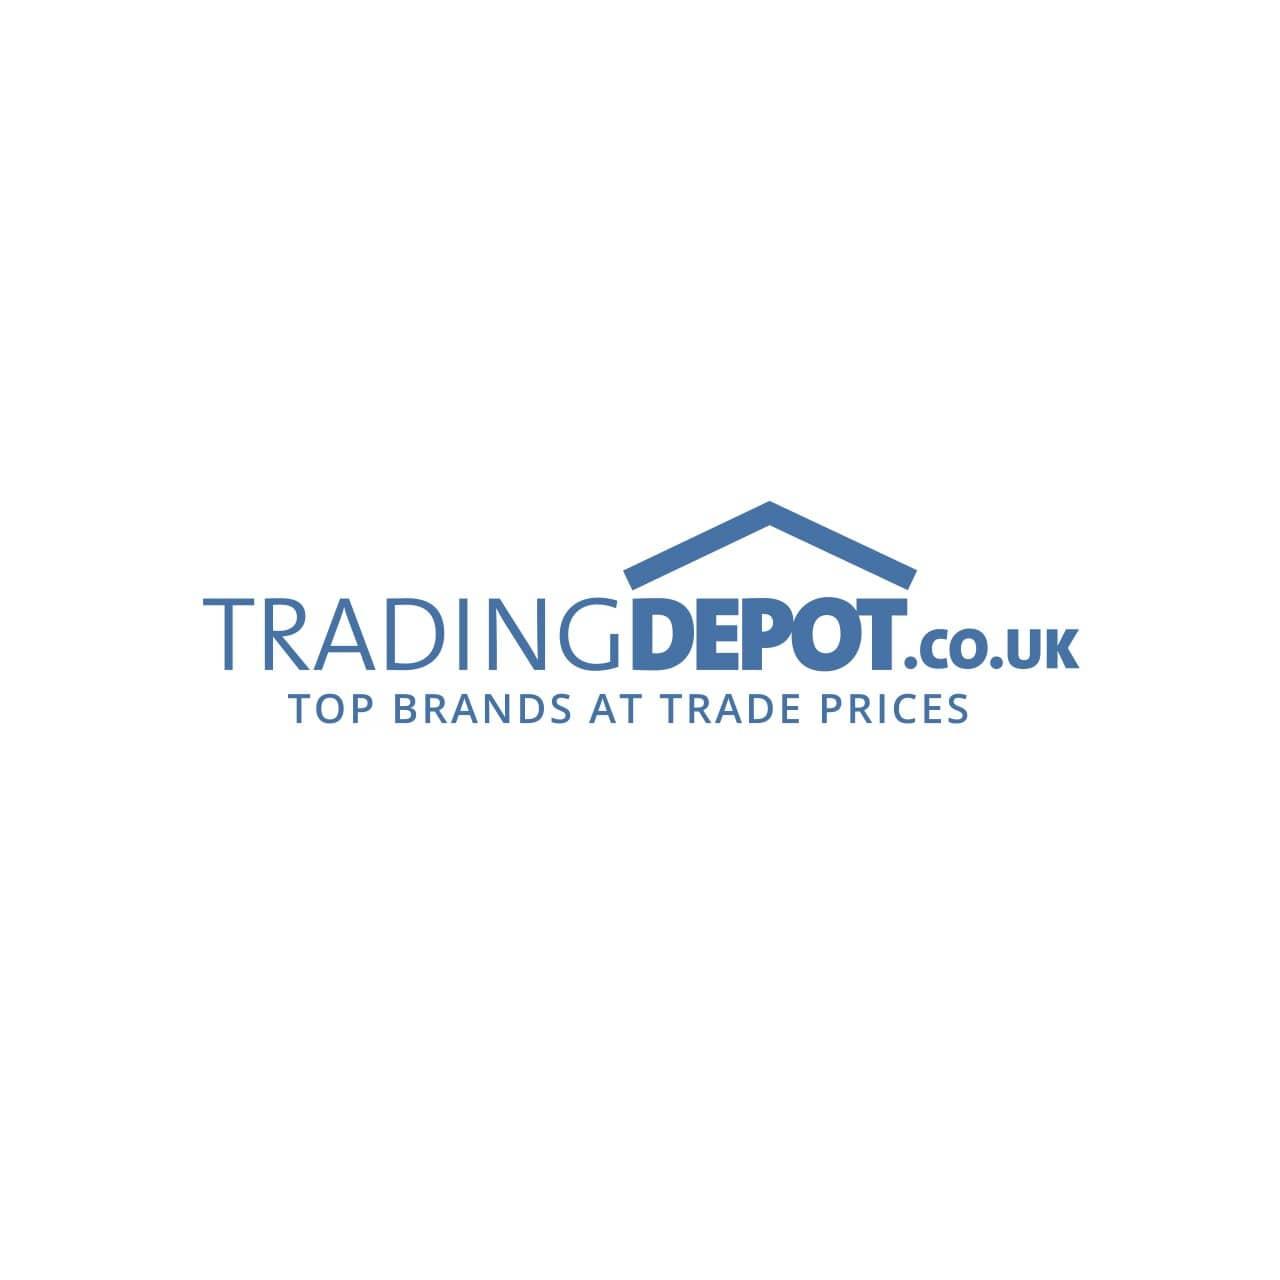 Velux Integra Electric Roof Window - Triple Glazed with Anti-Dew & Easy to Clean Glazing – White Painted 134 x 140cm - GGL UK08 206621U